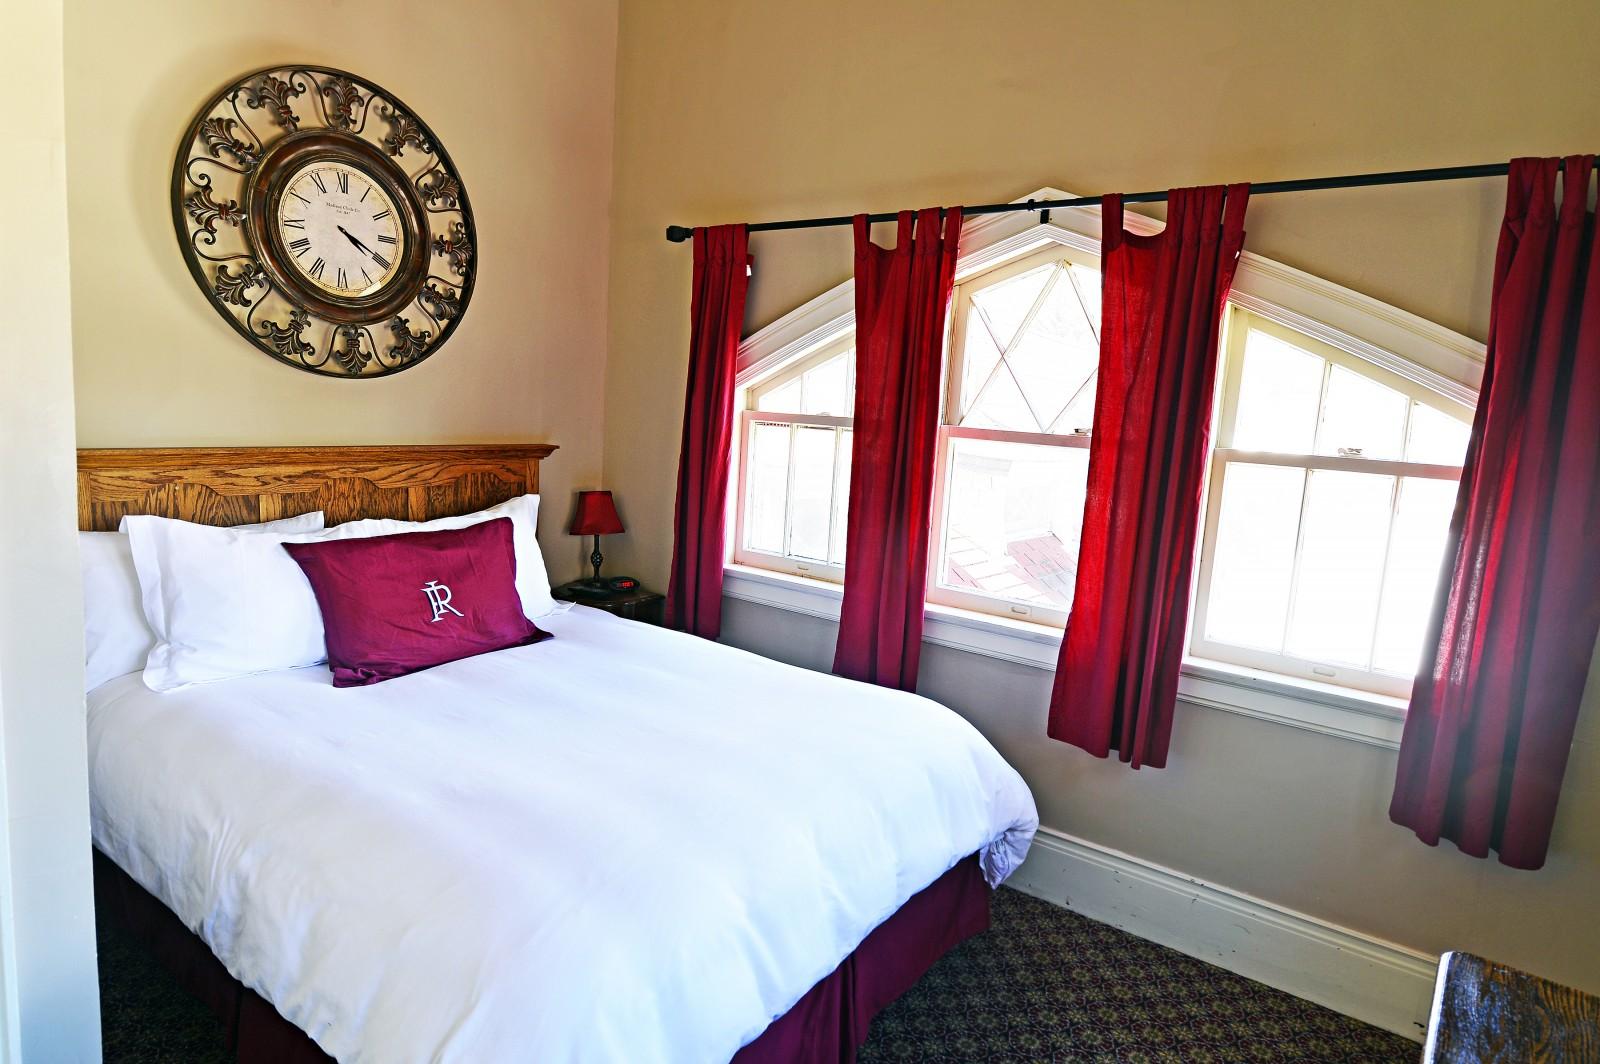 Redstone Inn Tower Hotel Room, Colorado